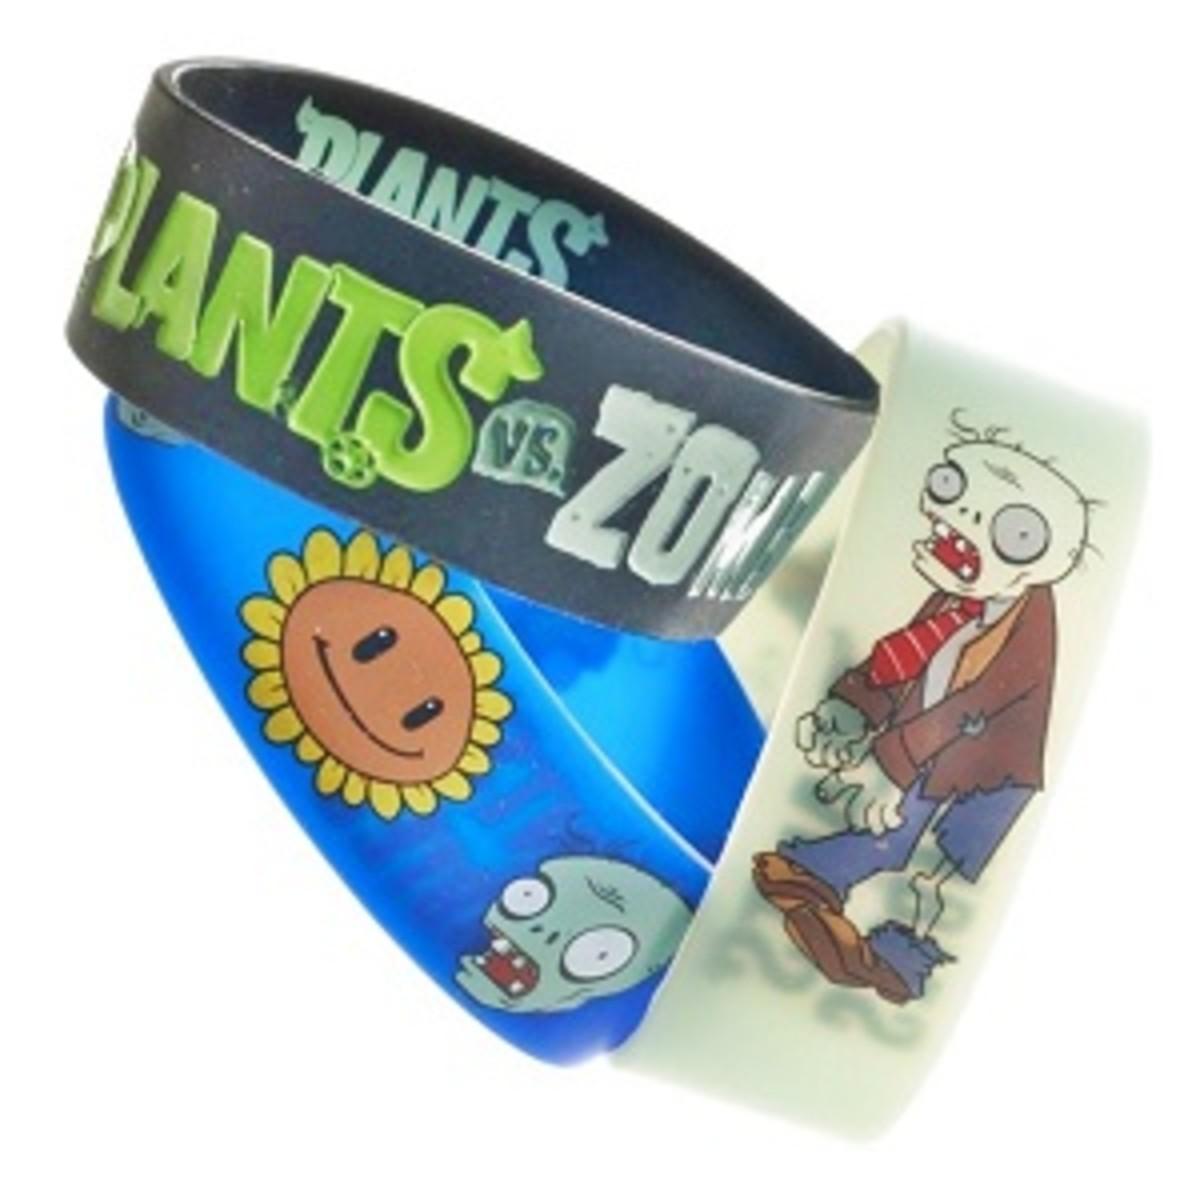 Plants vs Zombies wristband